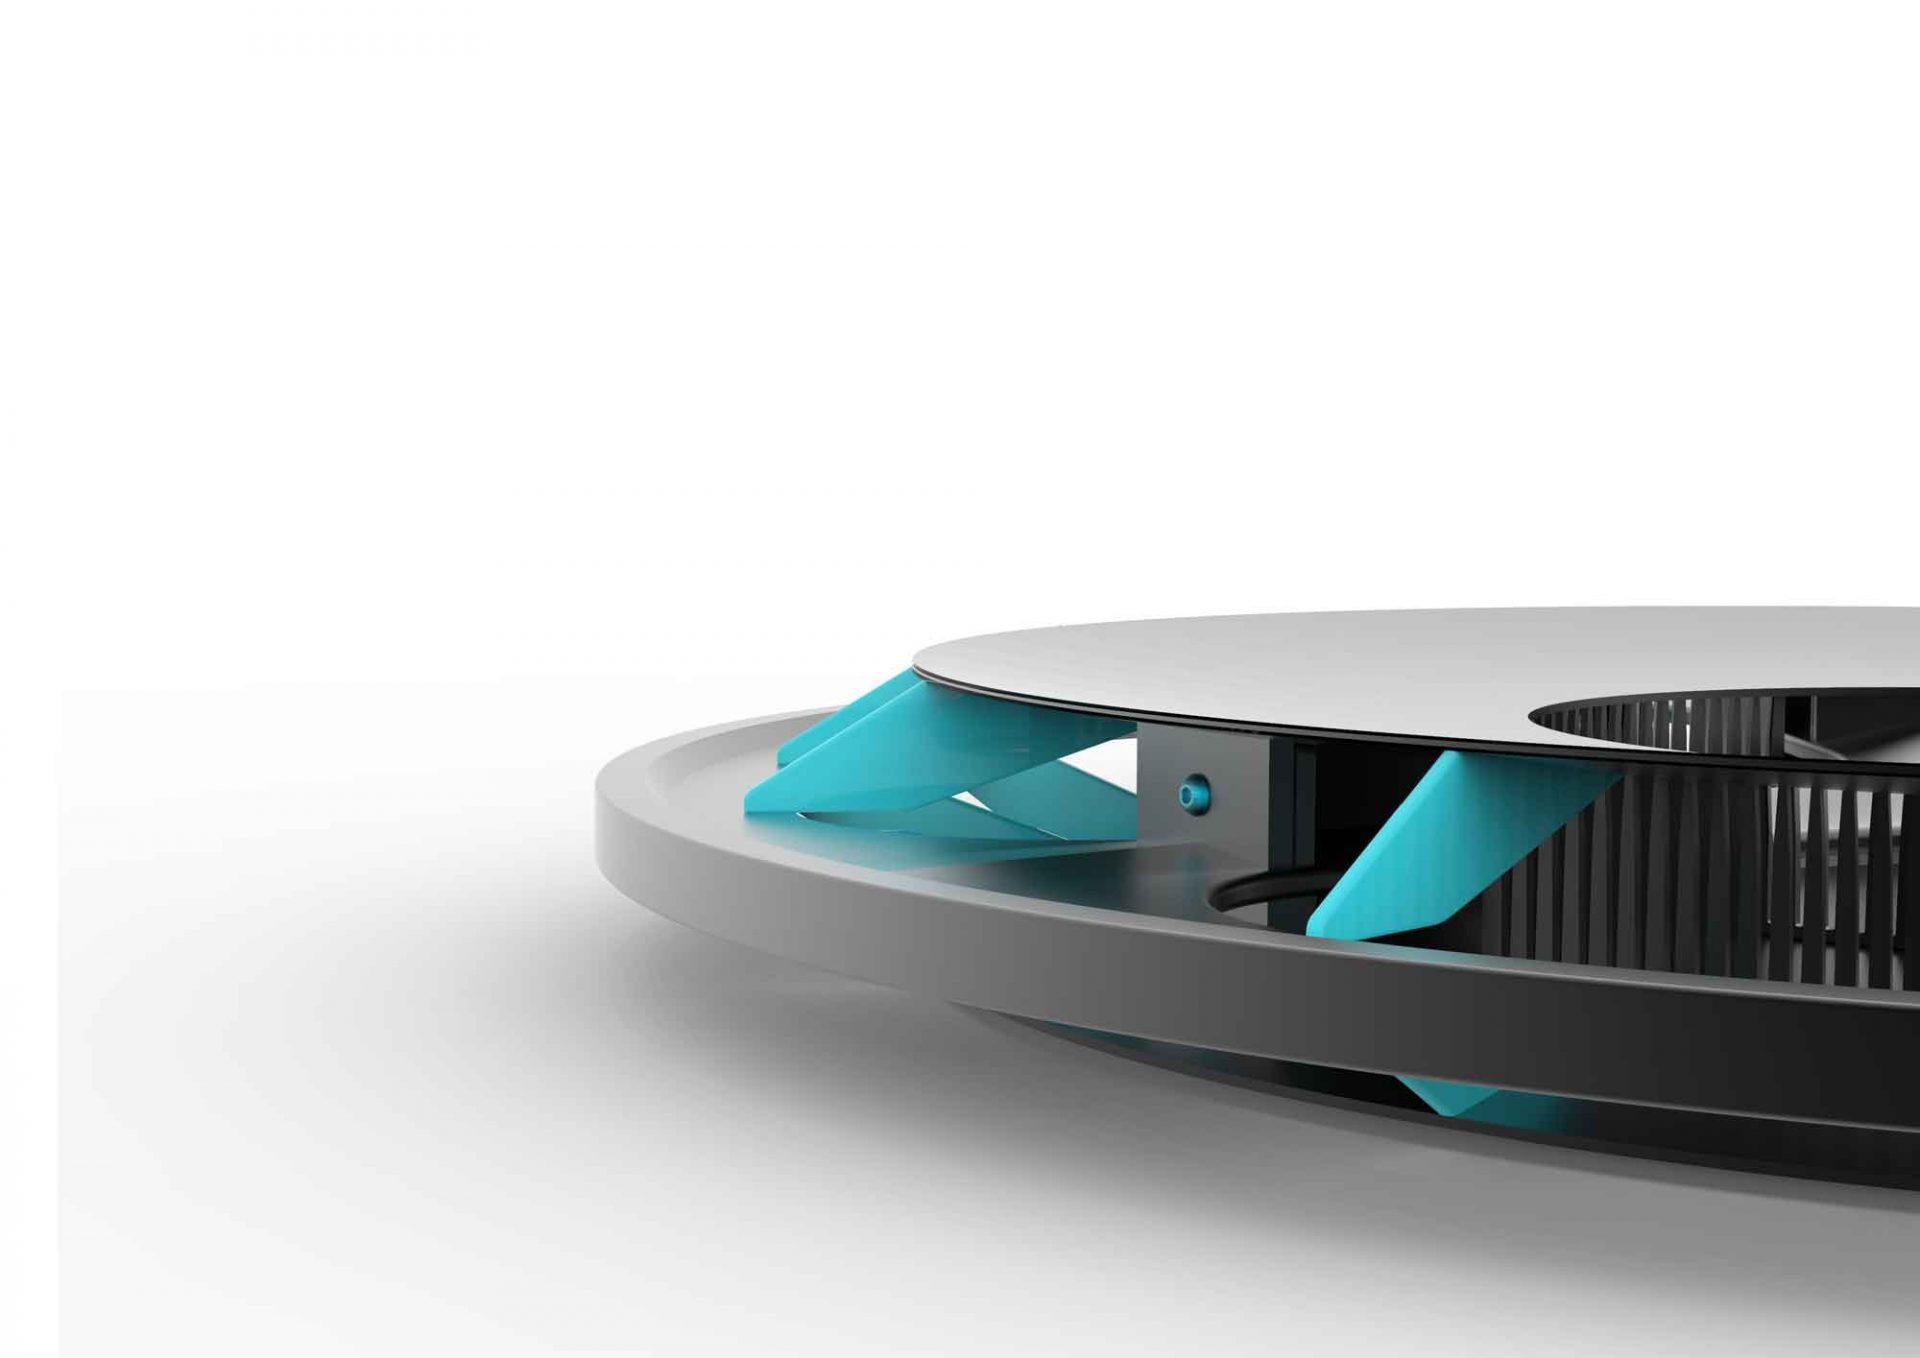 Design Educates Award, Winner Product Design